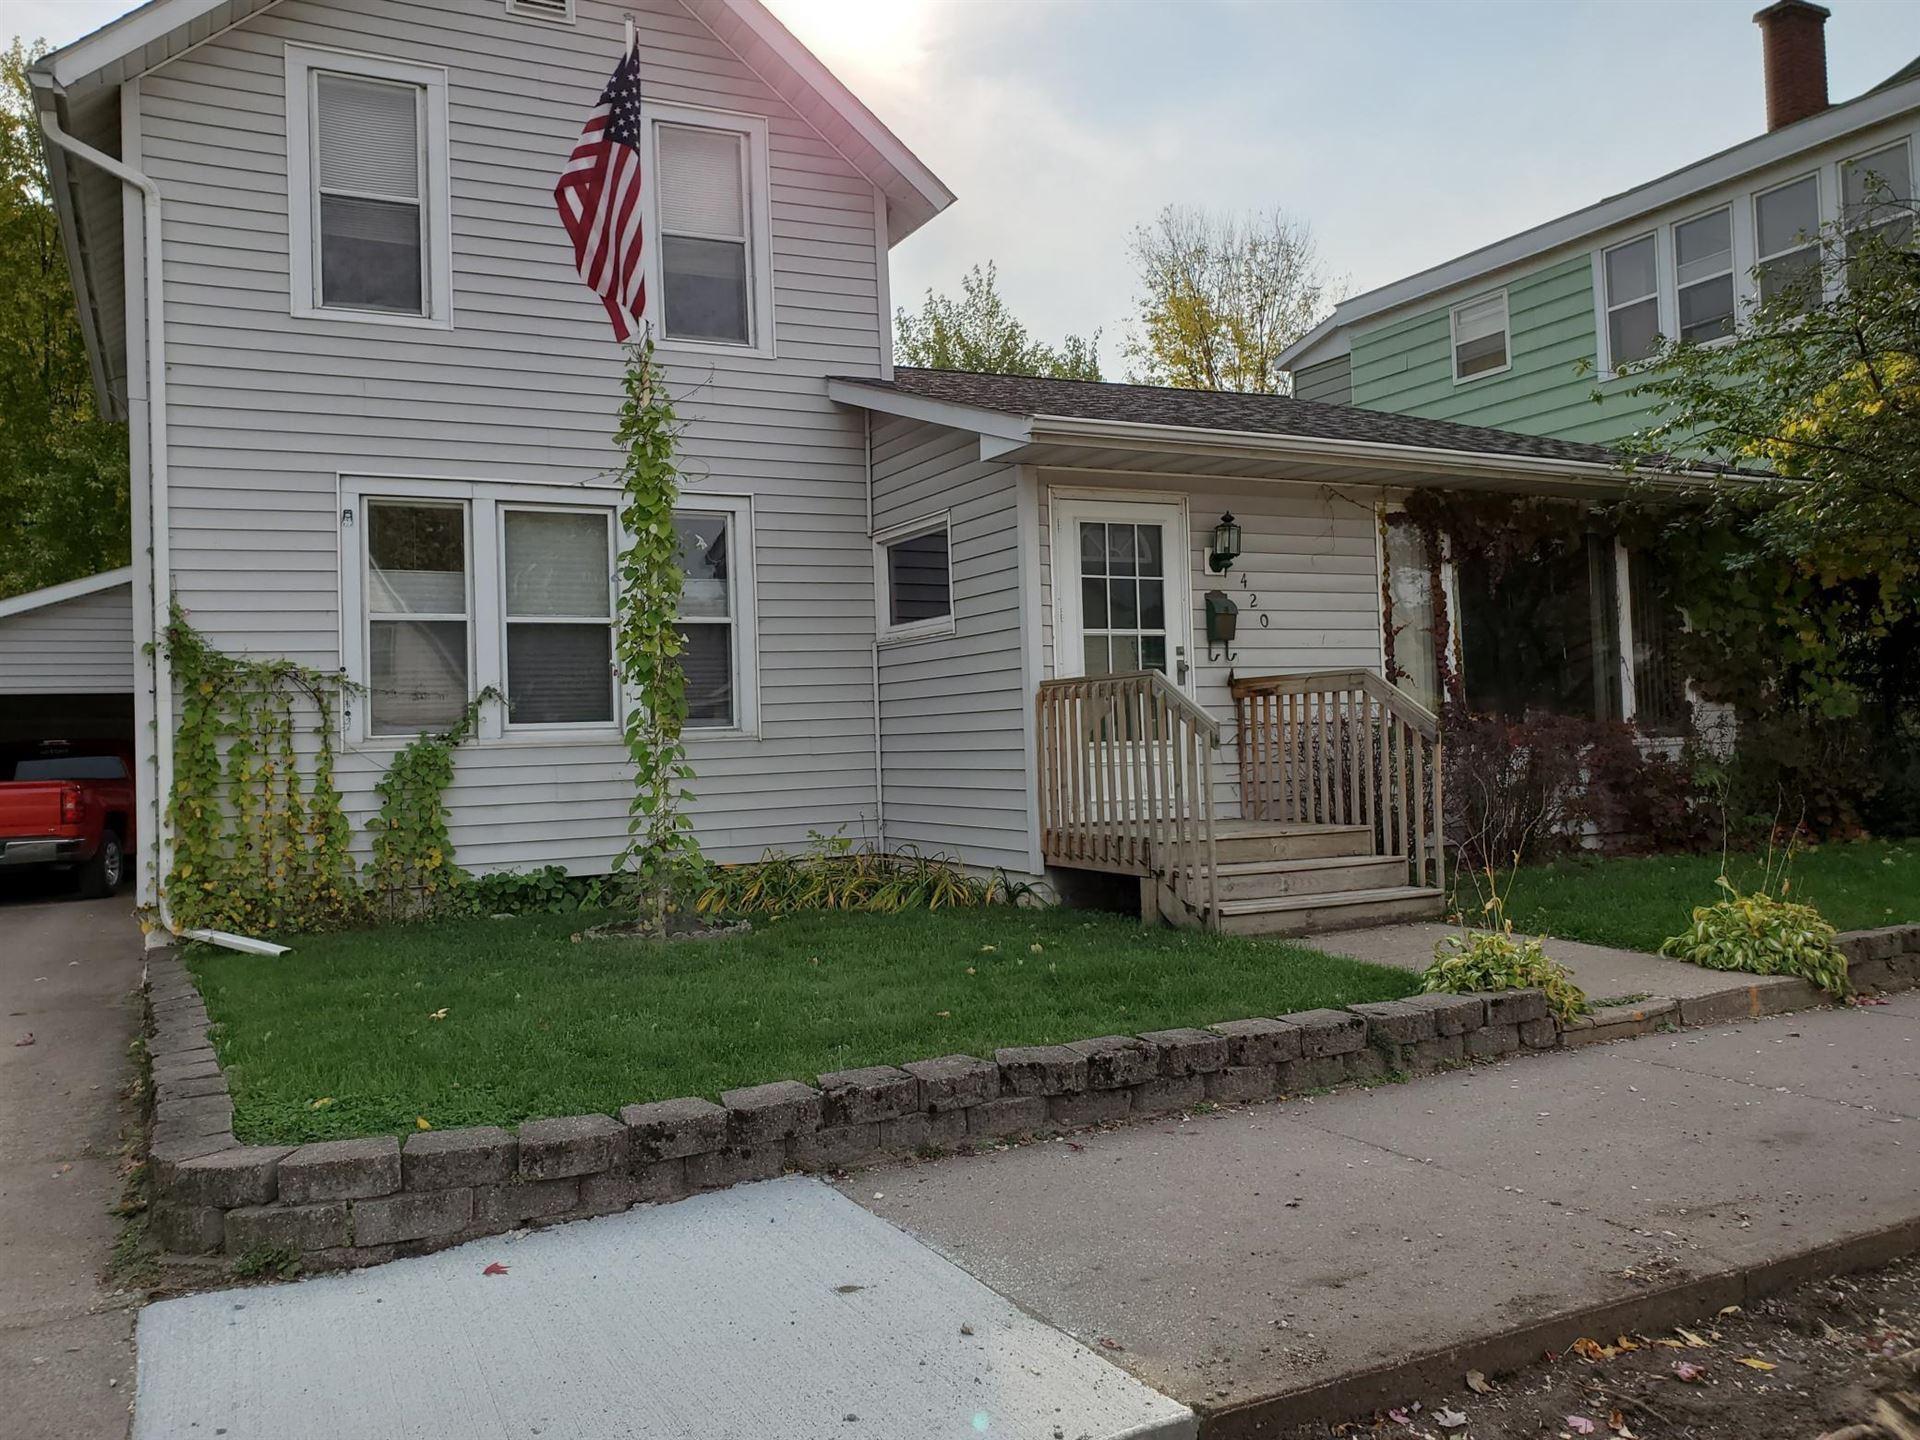 420 Sioux Street, Winona, MN 55987 - MLS#: 5672659